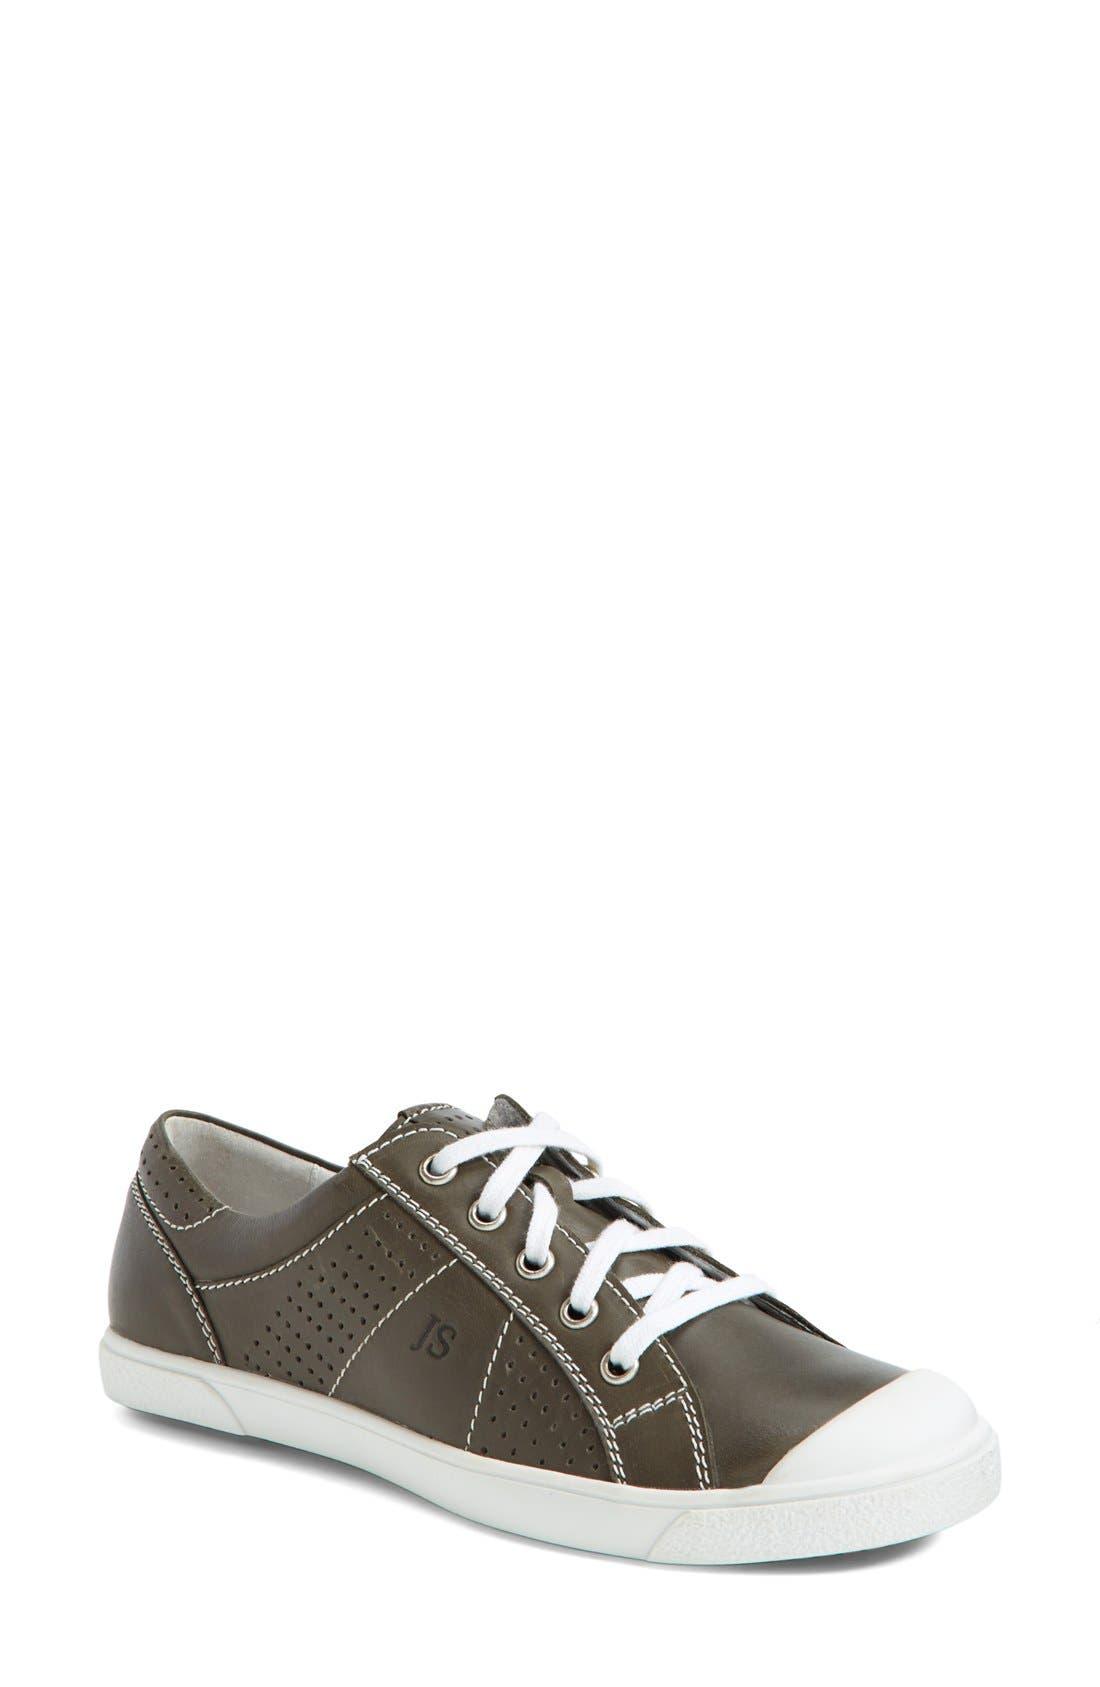 Main Image - Josef Seibel 'Lilo 13' Leather Sneaker ...